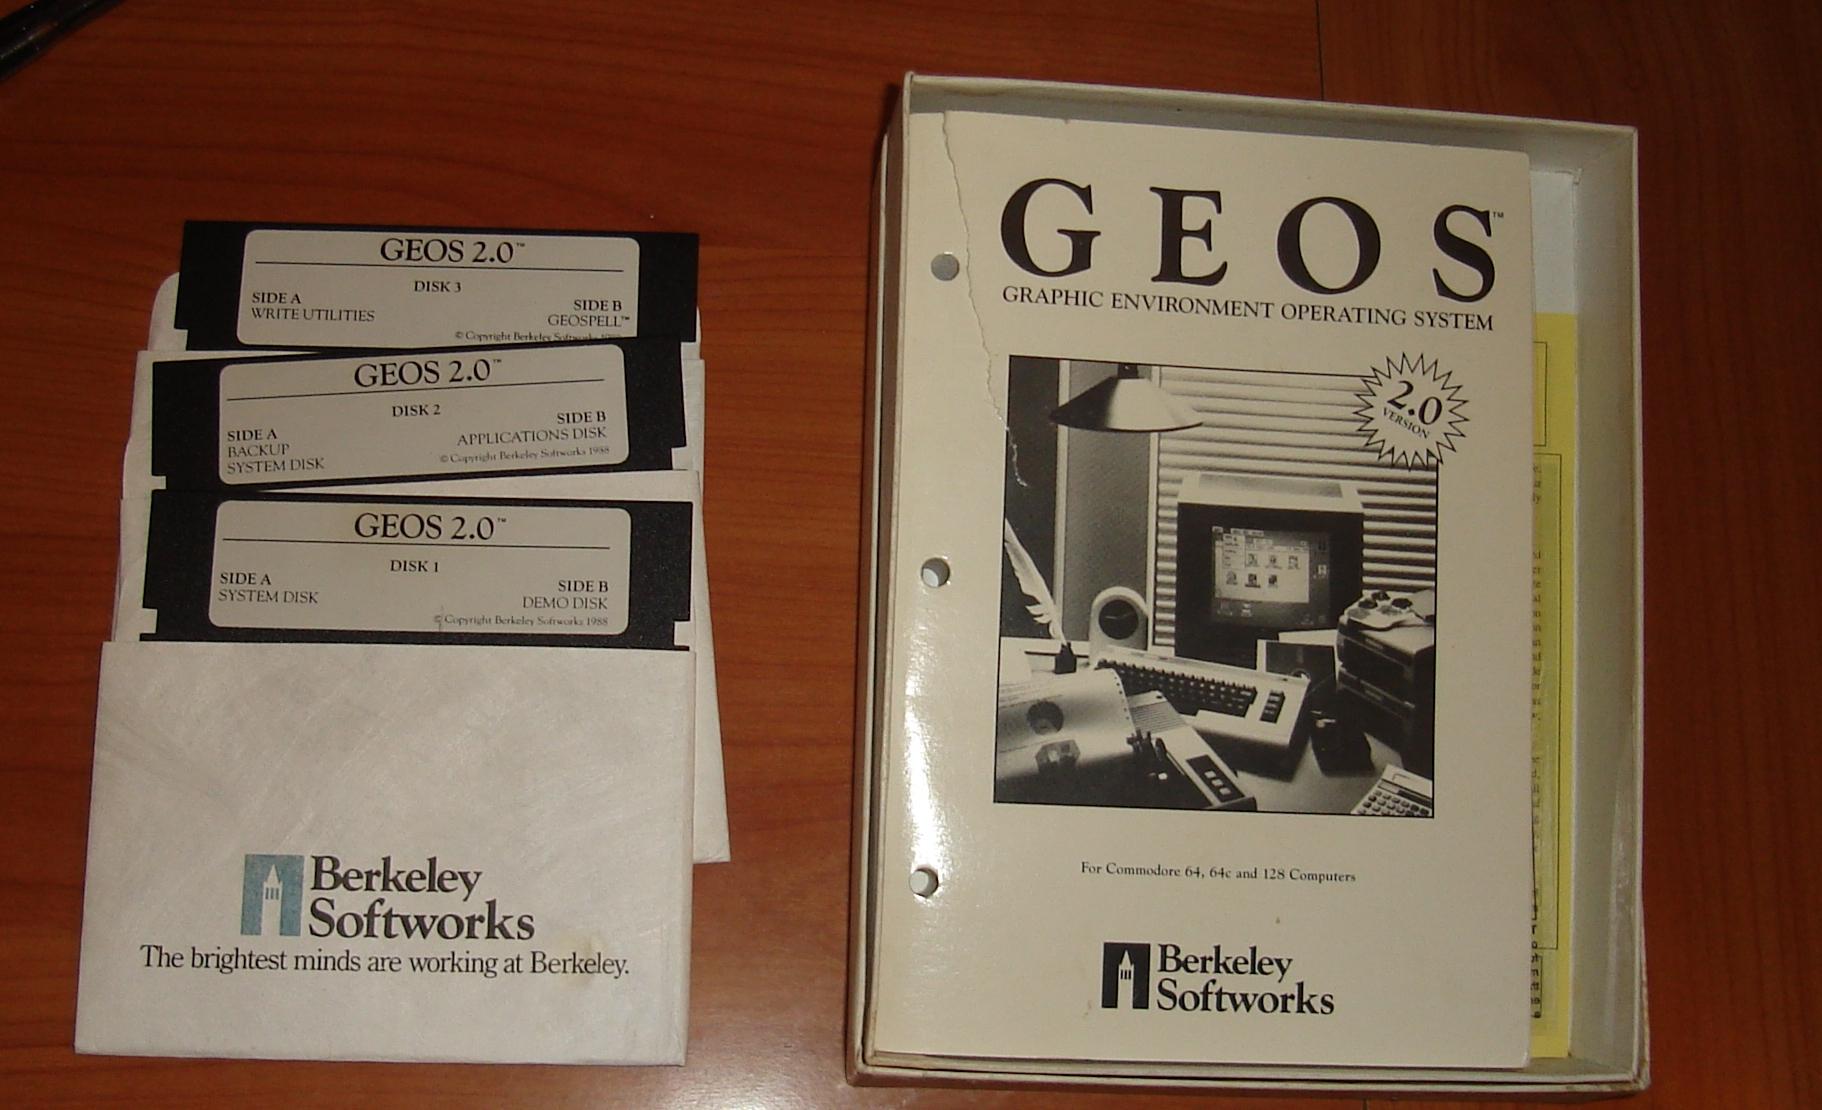 GEOS 2.0